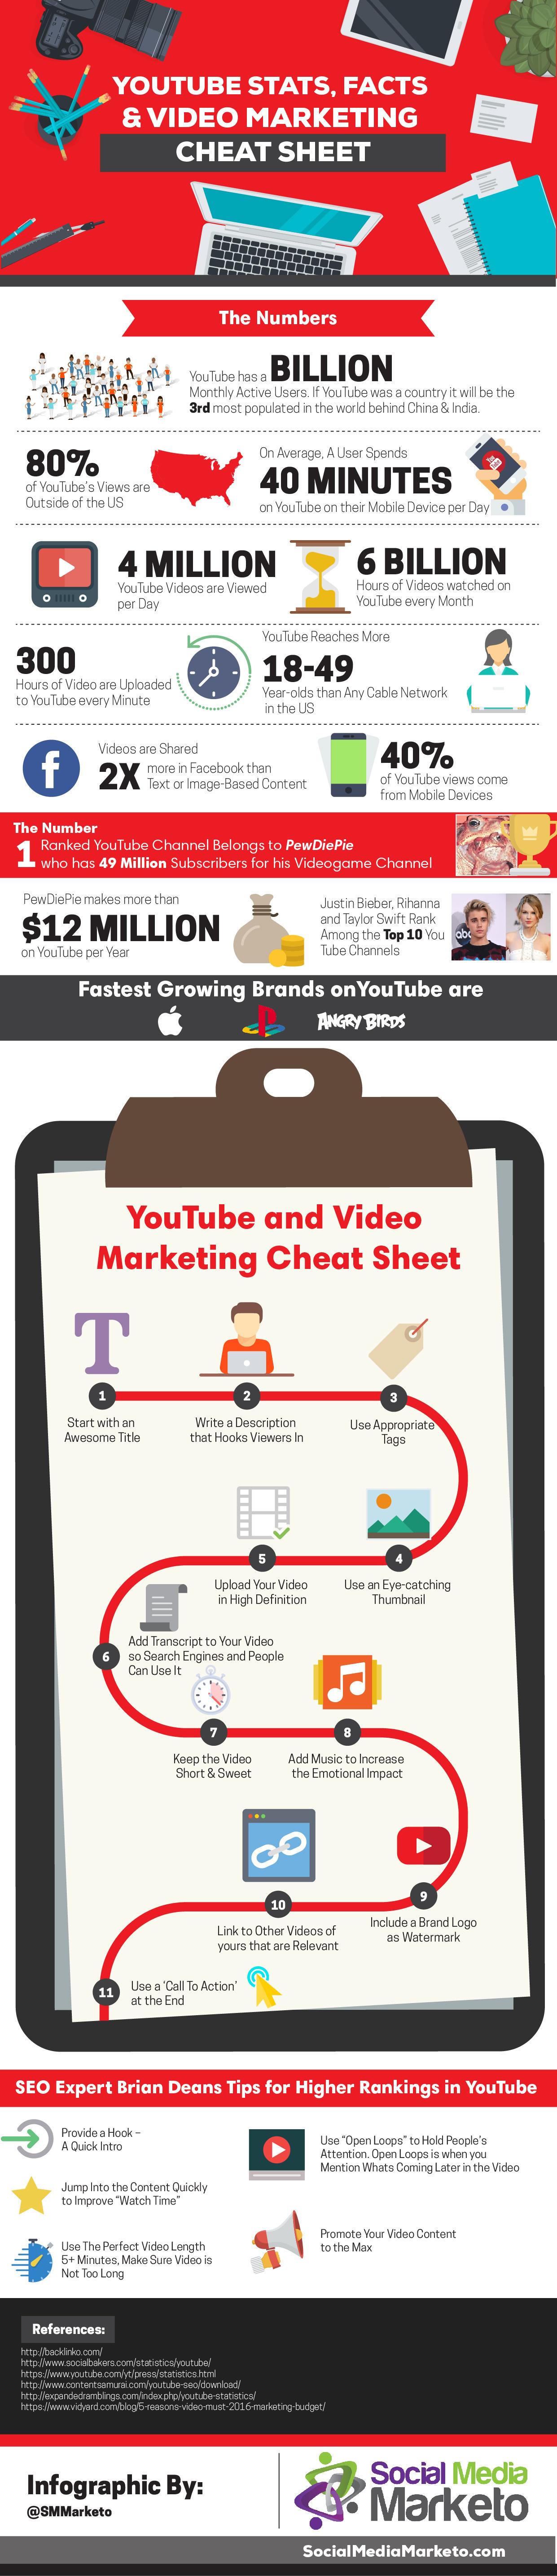 YouTube Marketing Cheat Sheet [Infographic] | Social Media Today